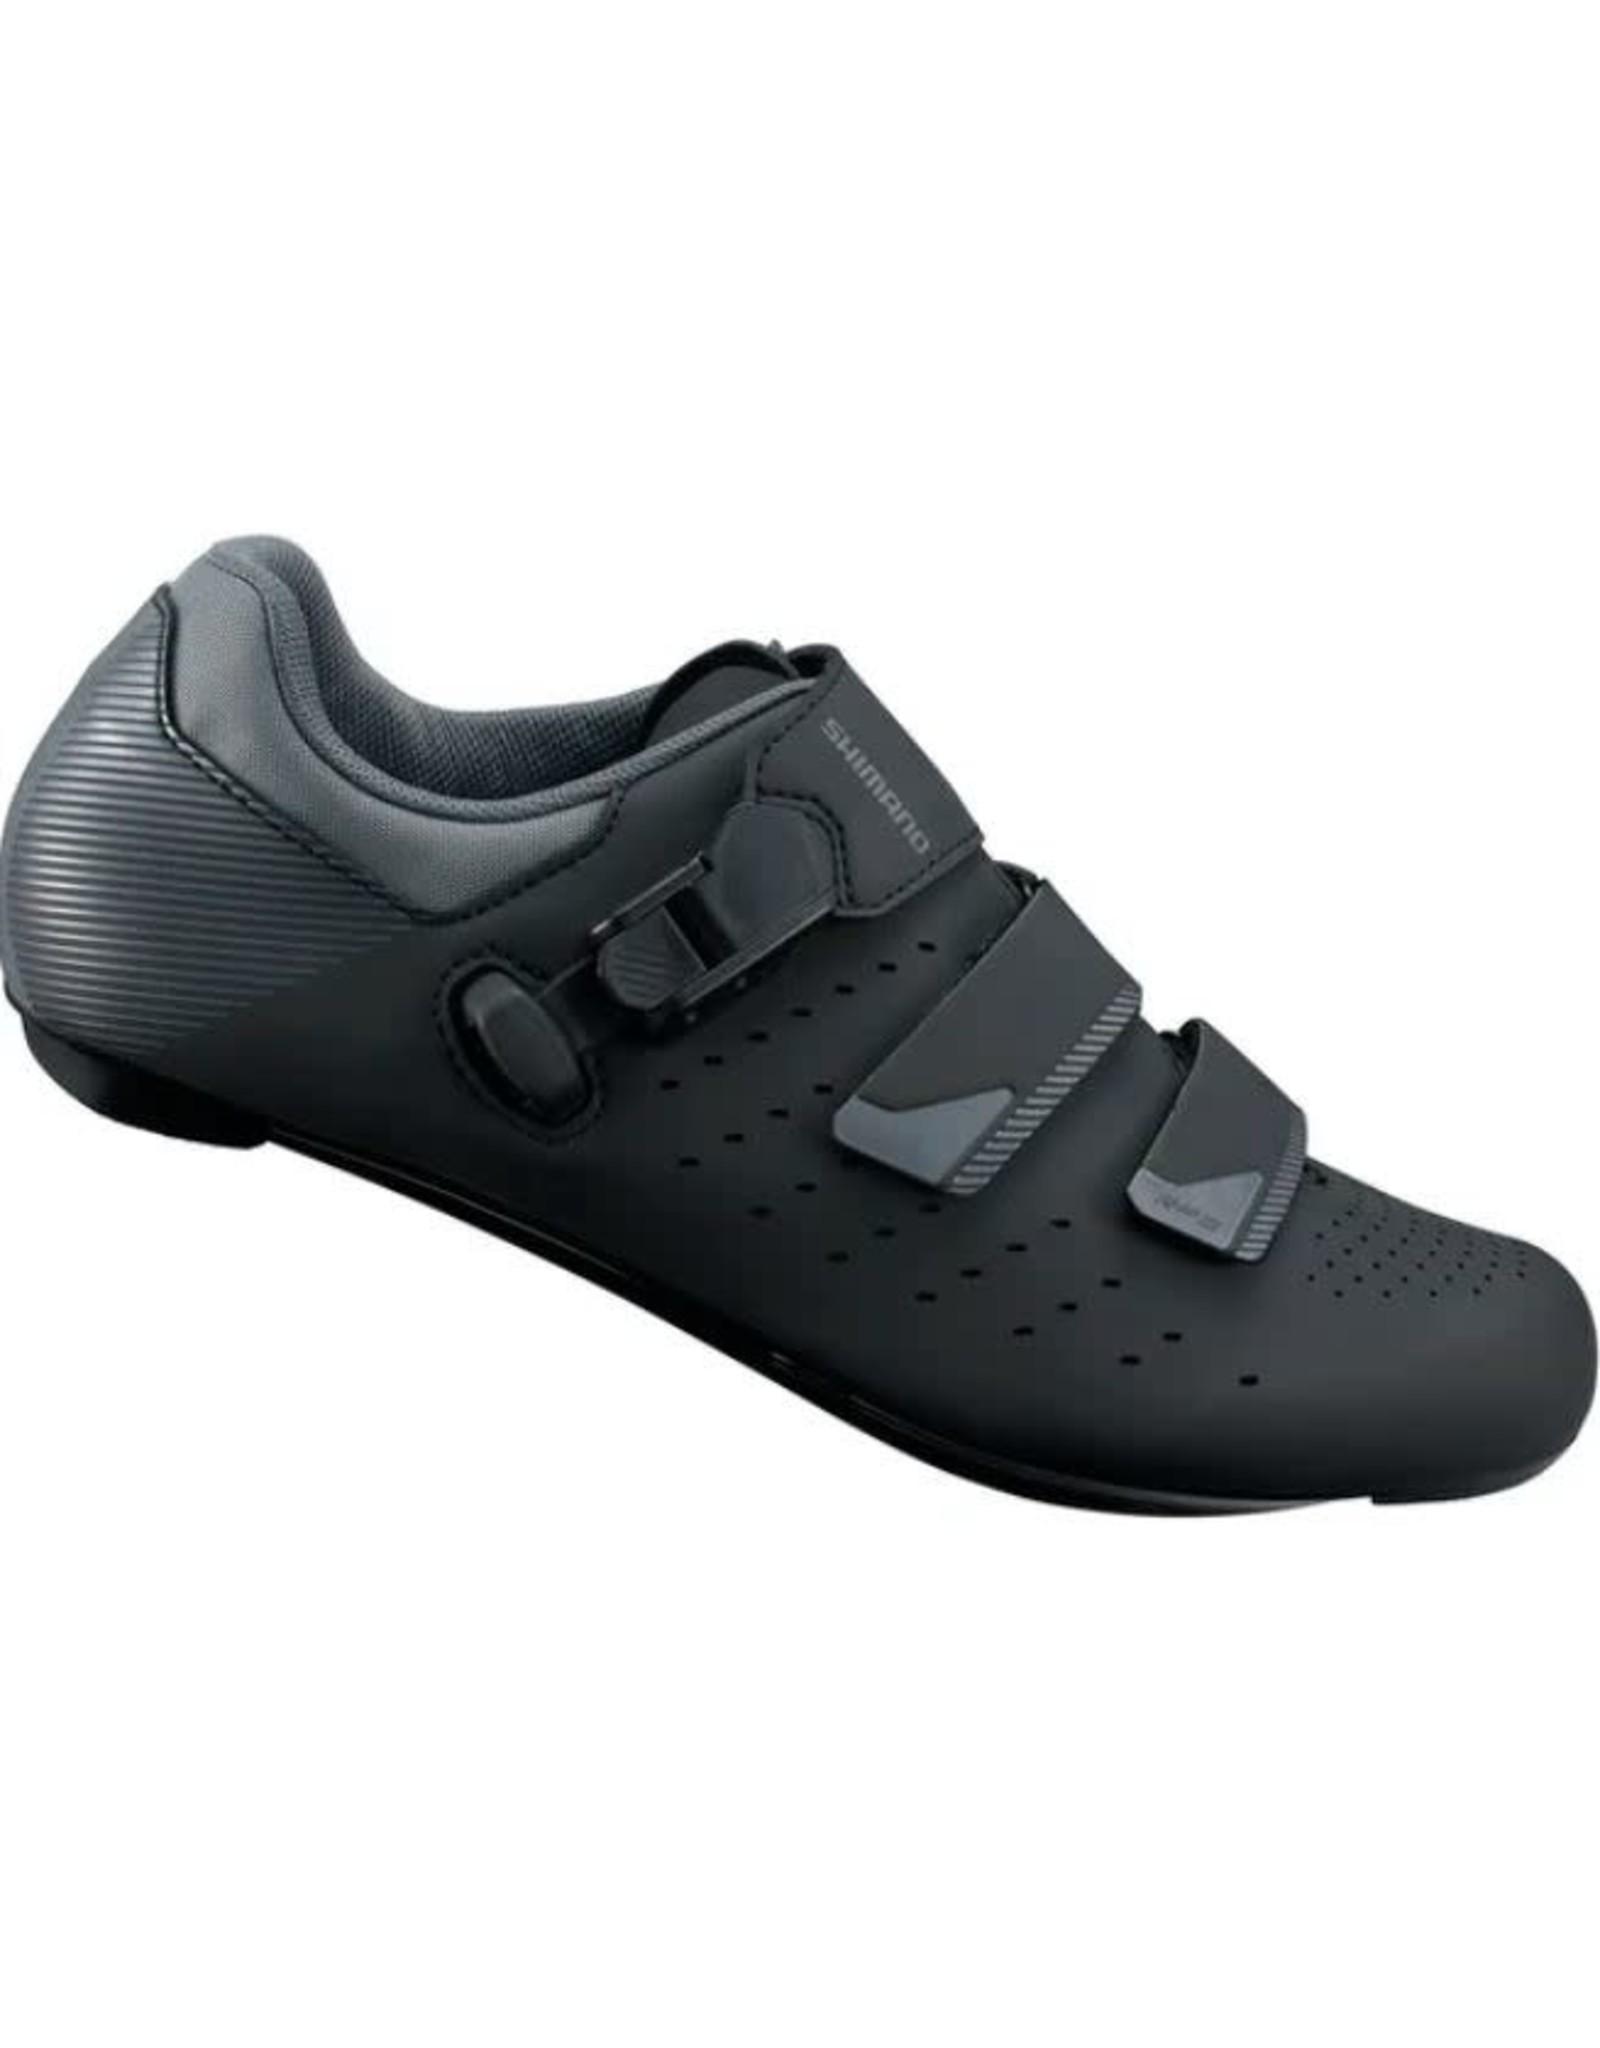 Shimano Shoes Shimano RP3 men